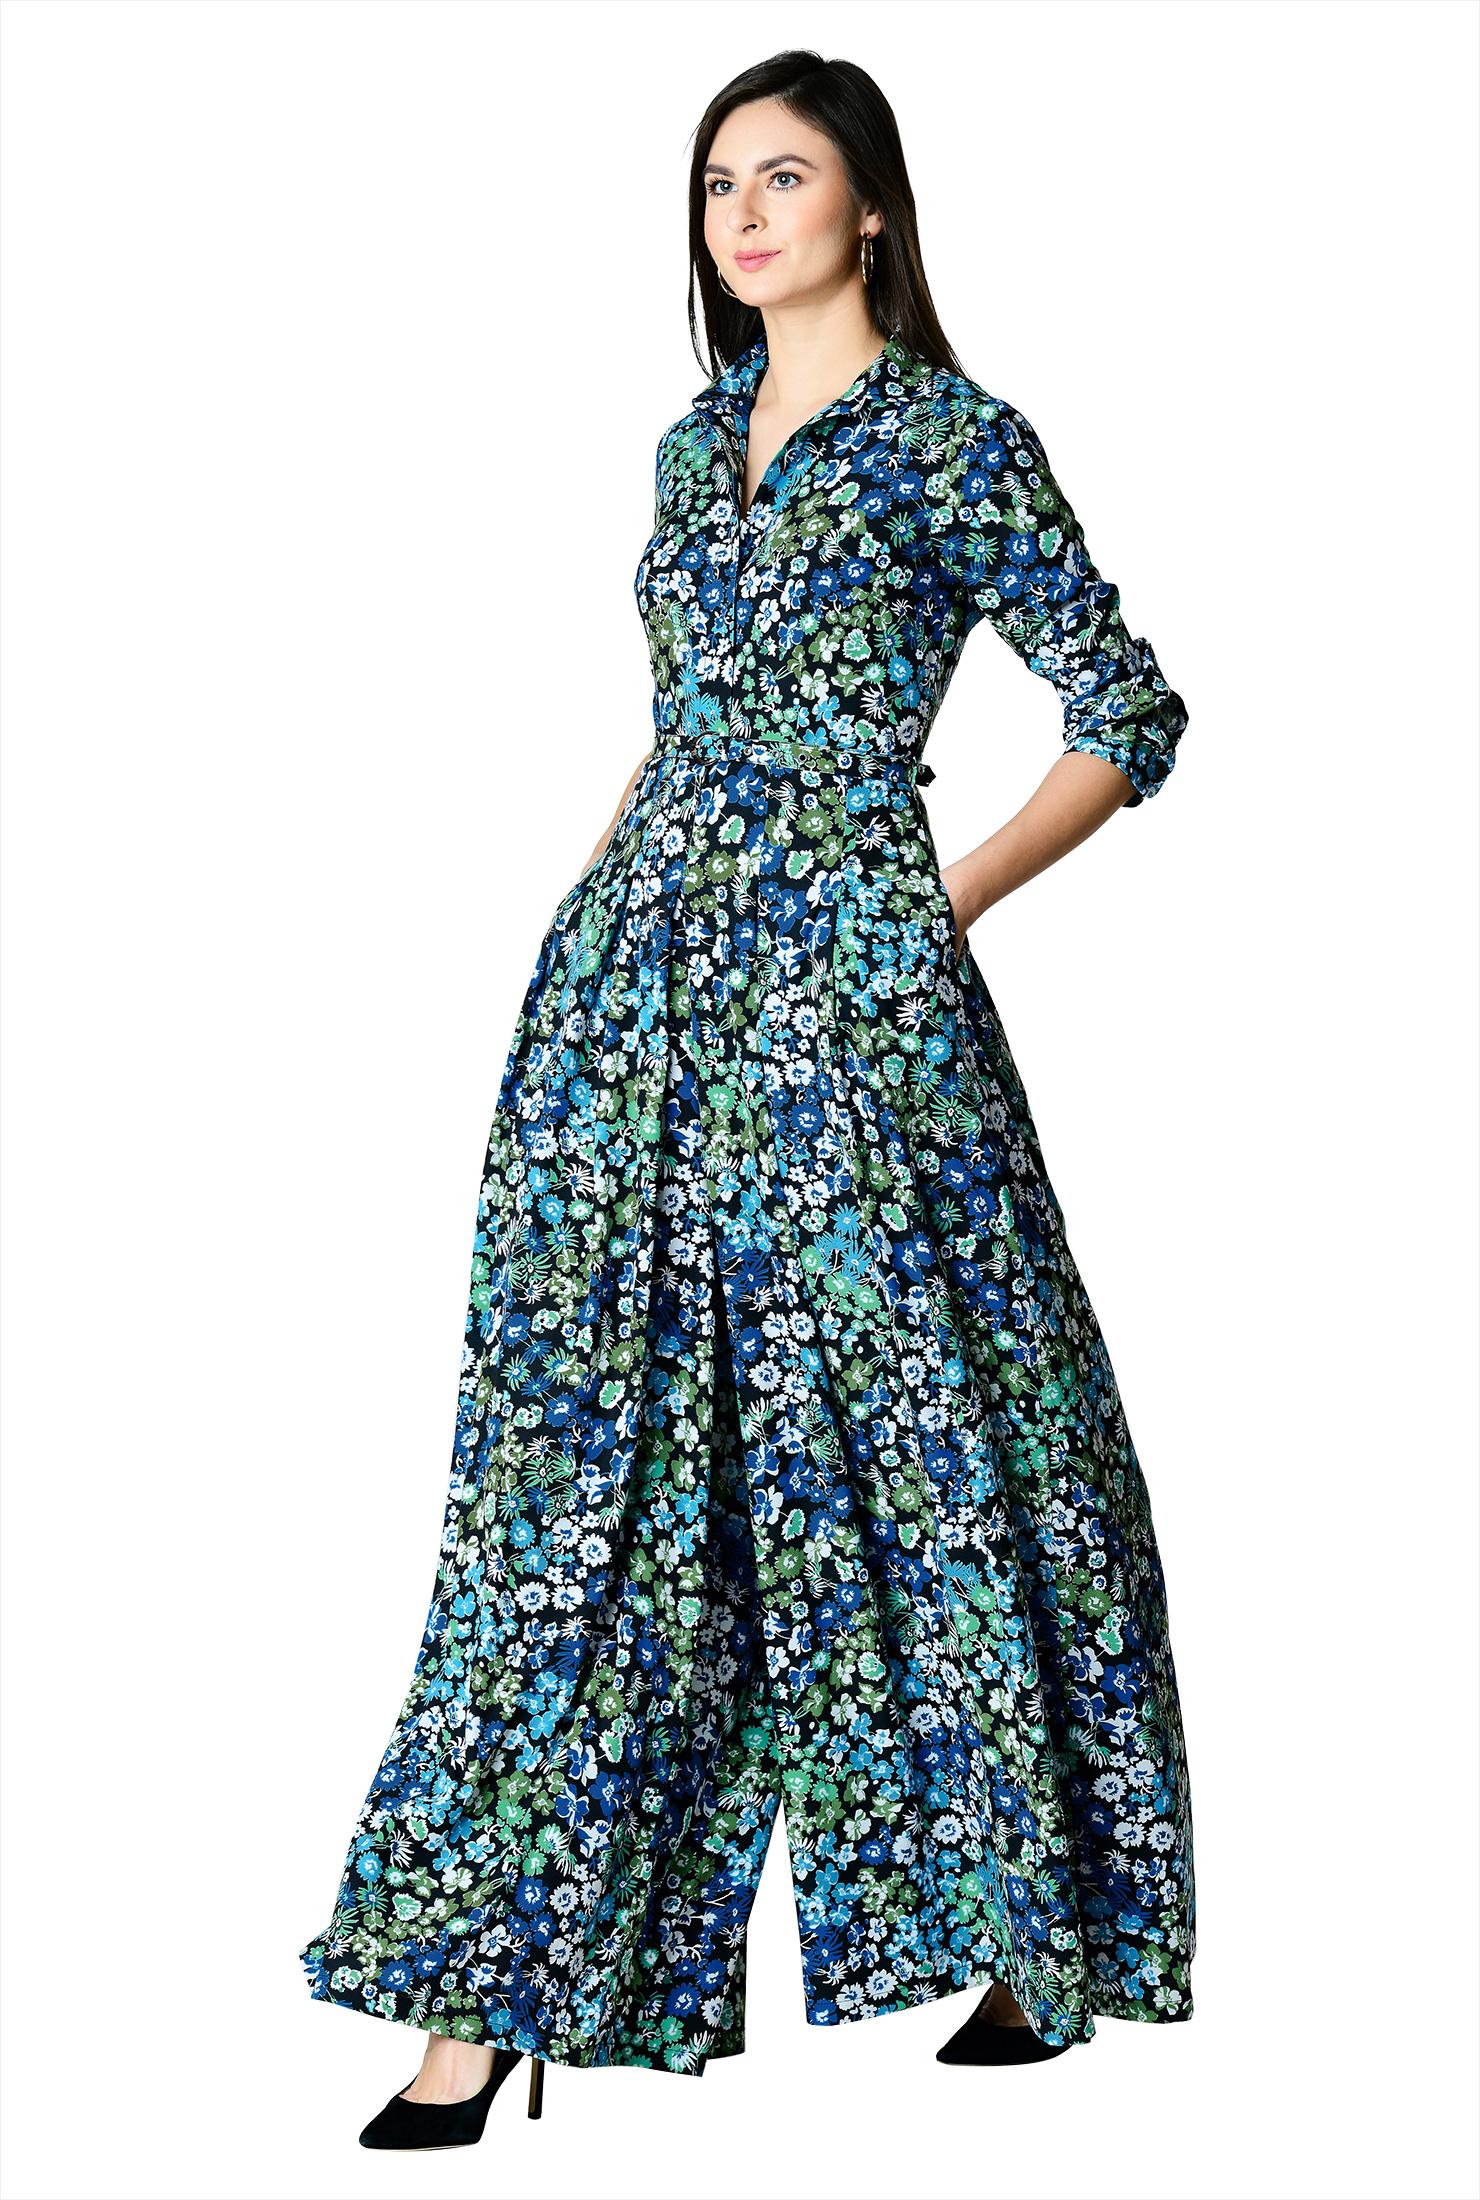 080516060ef Women s Fashion Clothing 0-36W and Custom